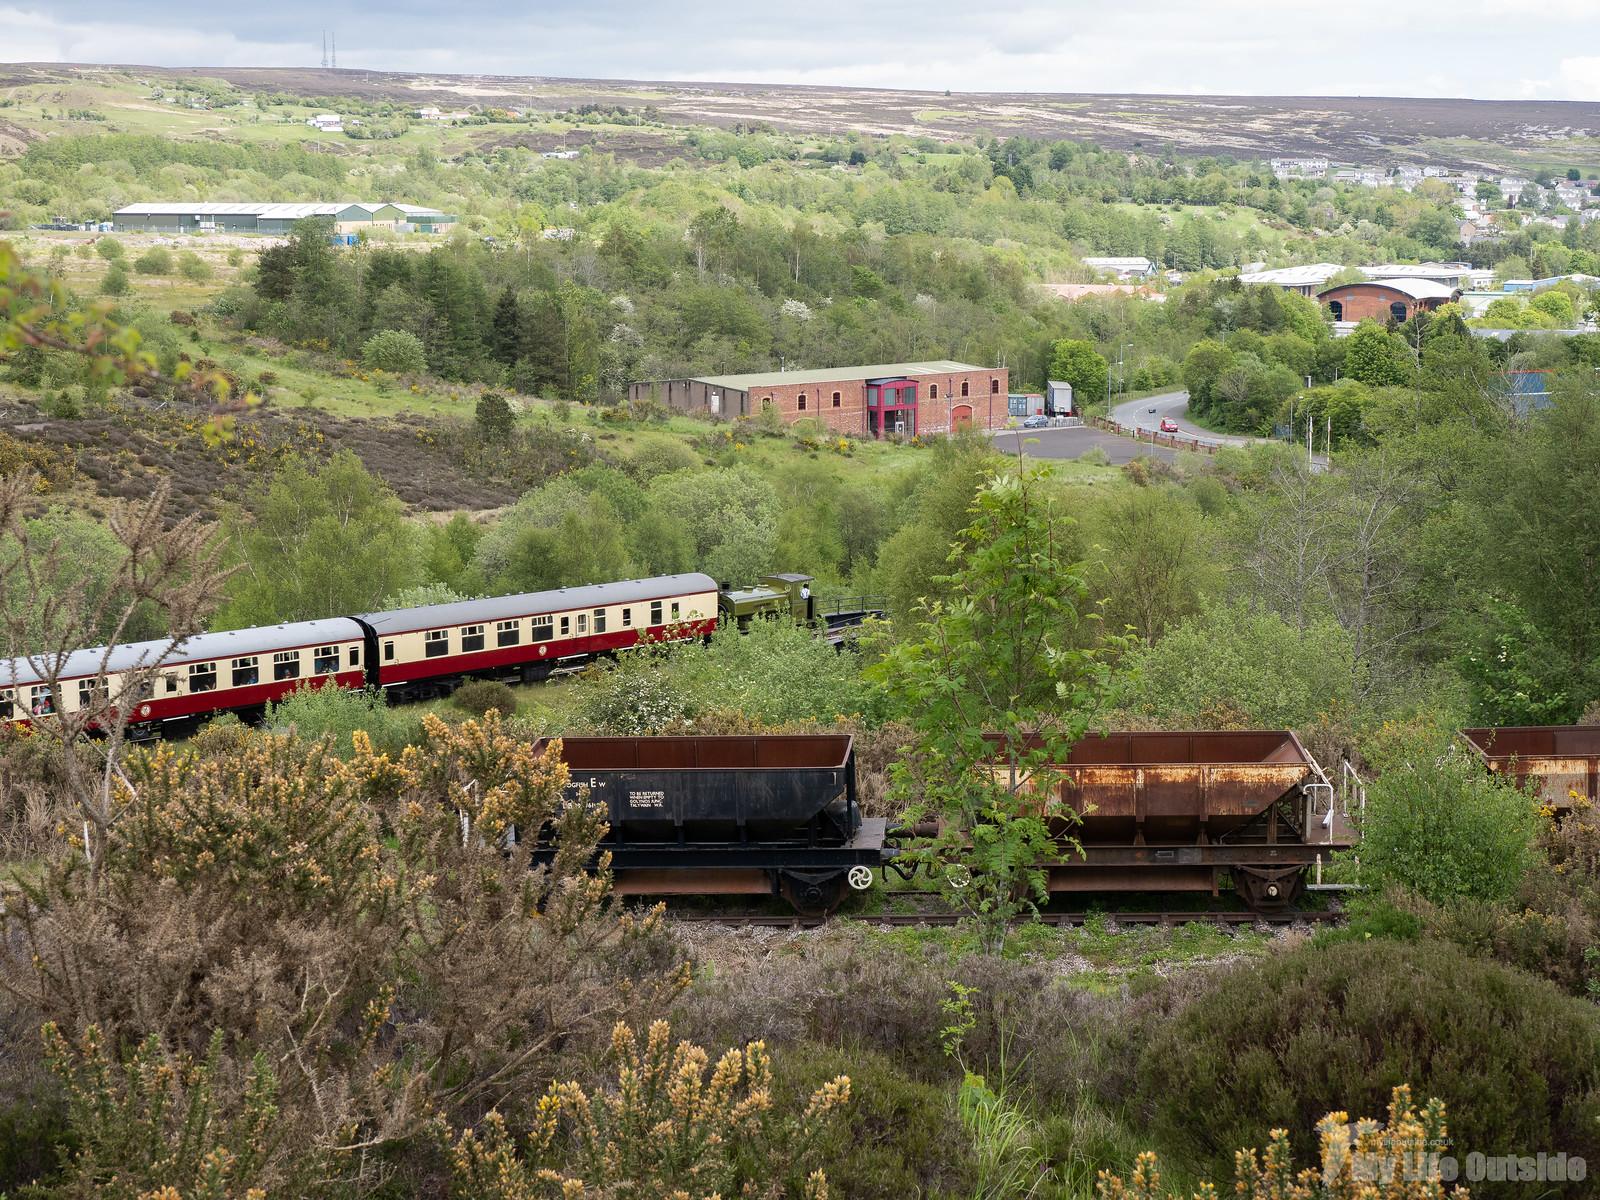 P6043056 - Pontypool and Blaenavon Railway